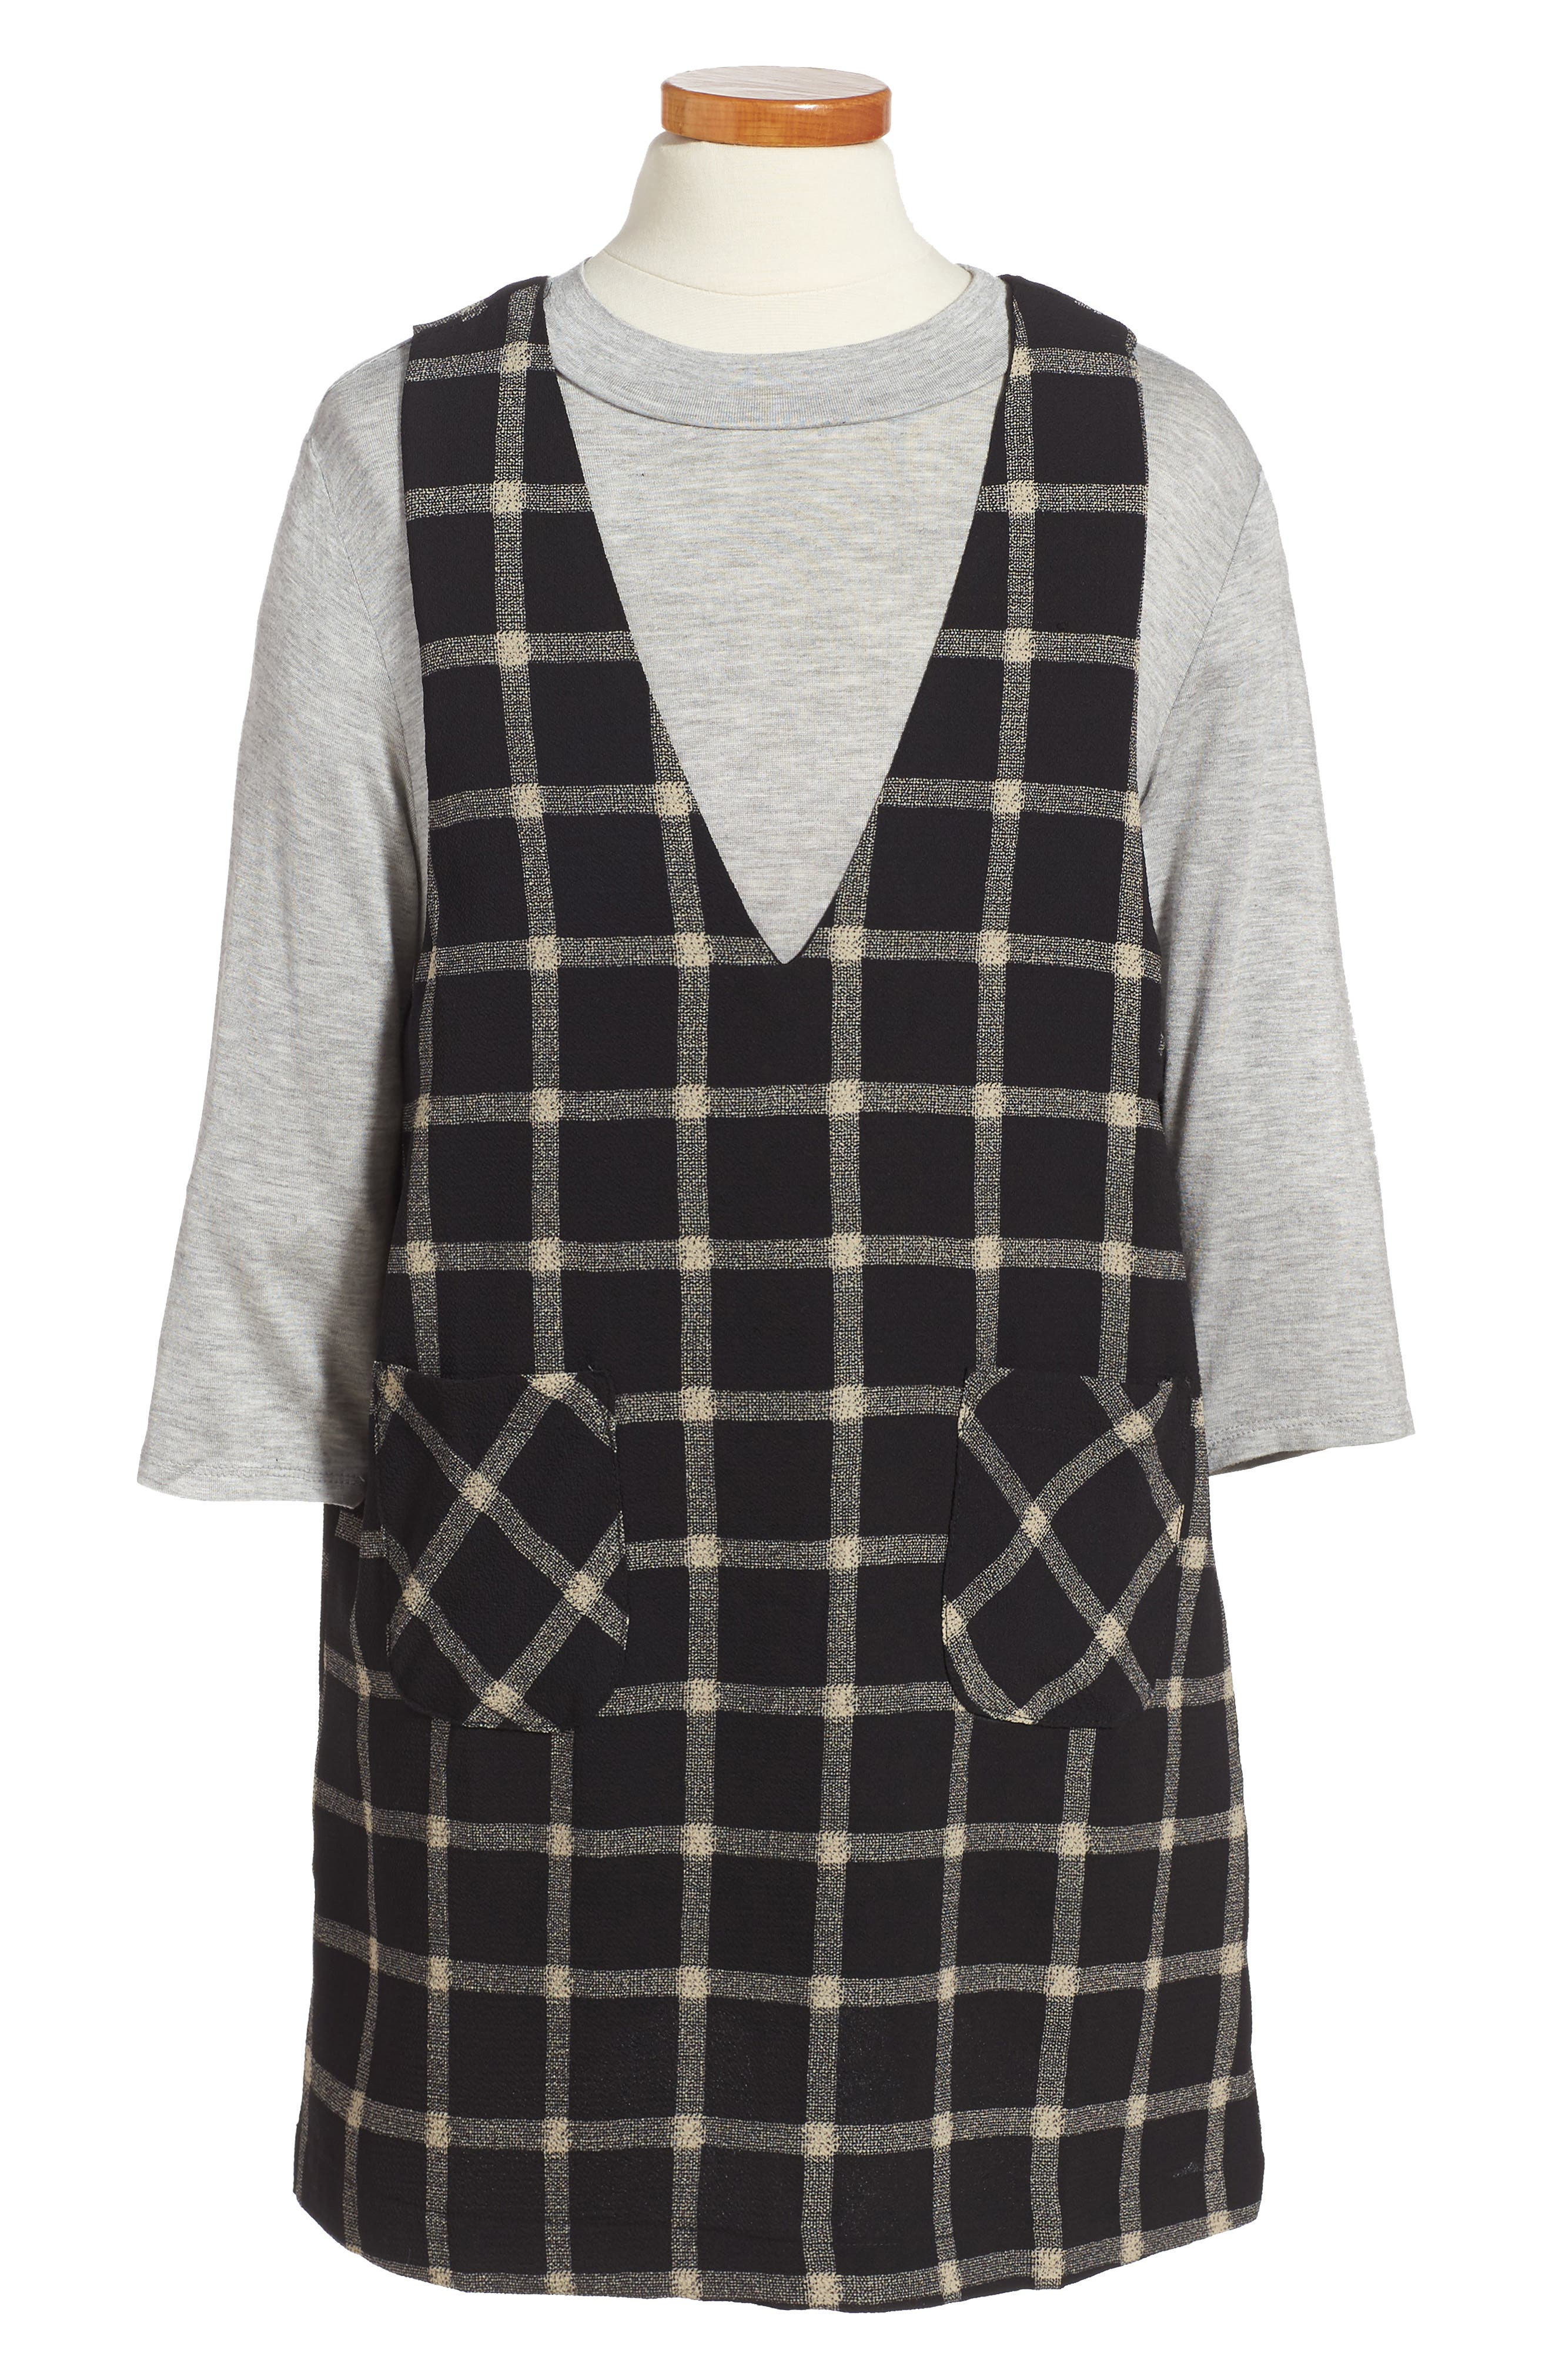 Alternate Image 1 Selected - Good Luck Gem Plaid Top & Jumper Dress Set (Big Girls)